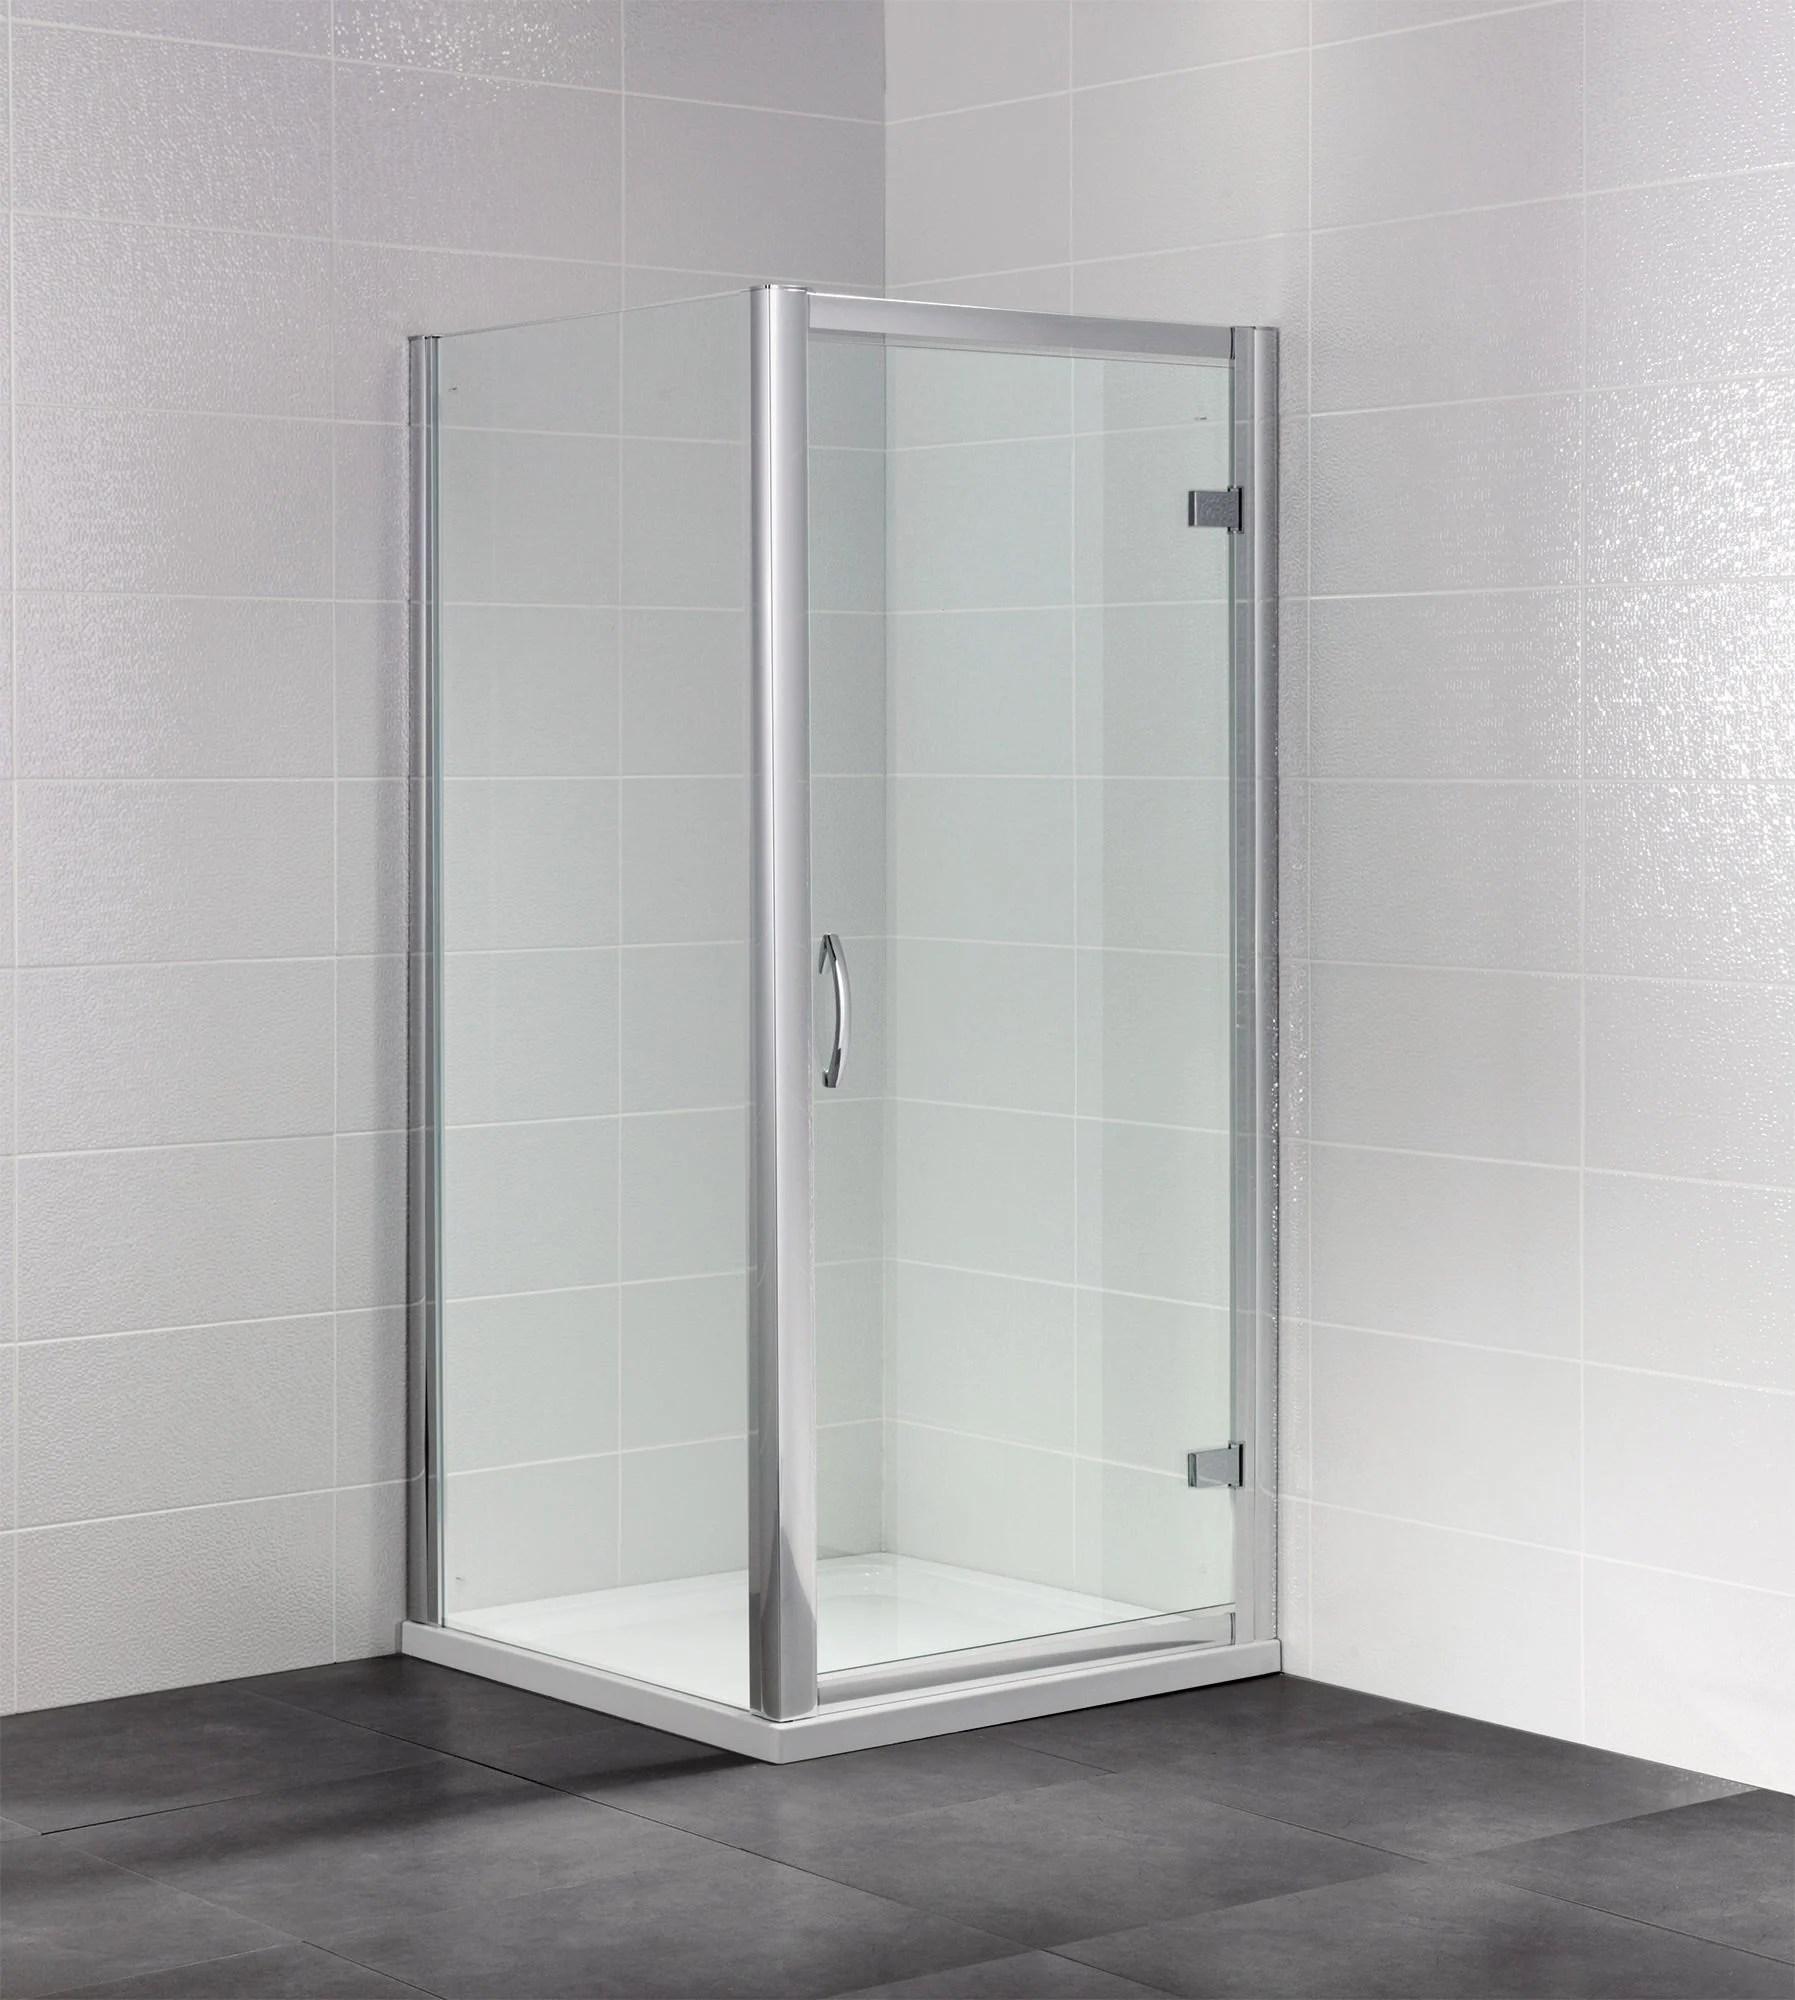 April Identiti2 1900mm High Semi Frameless Hinged Shower Door